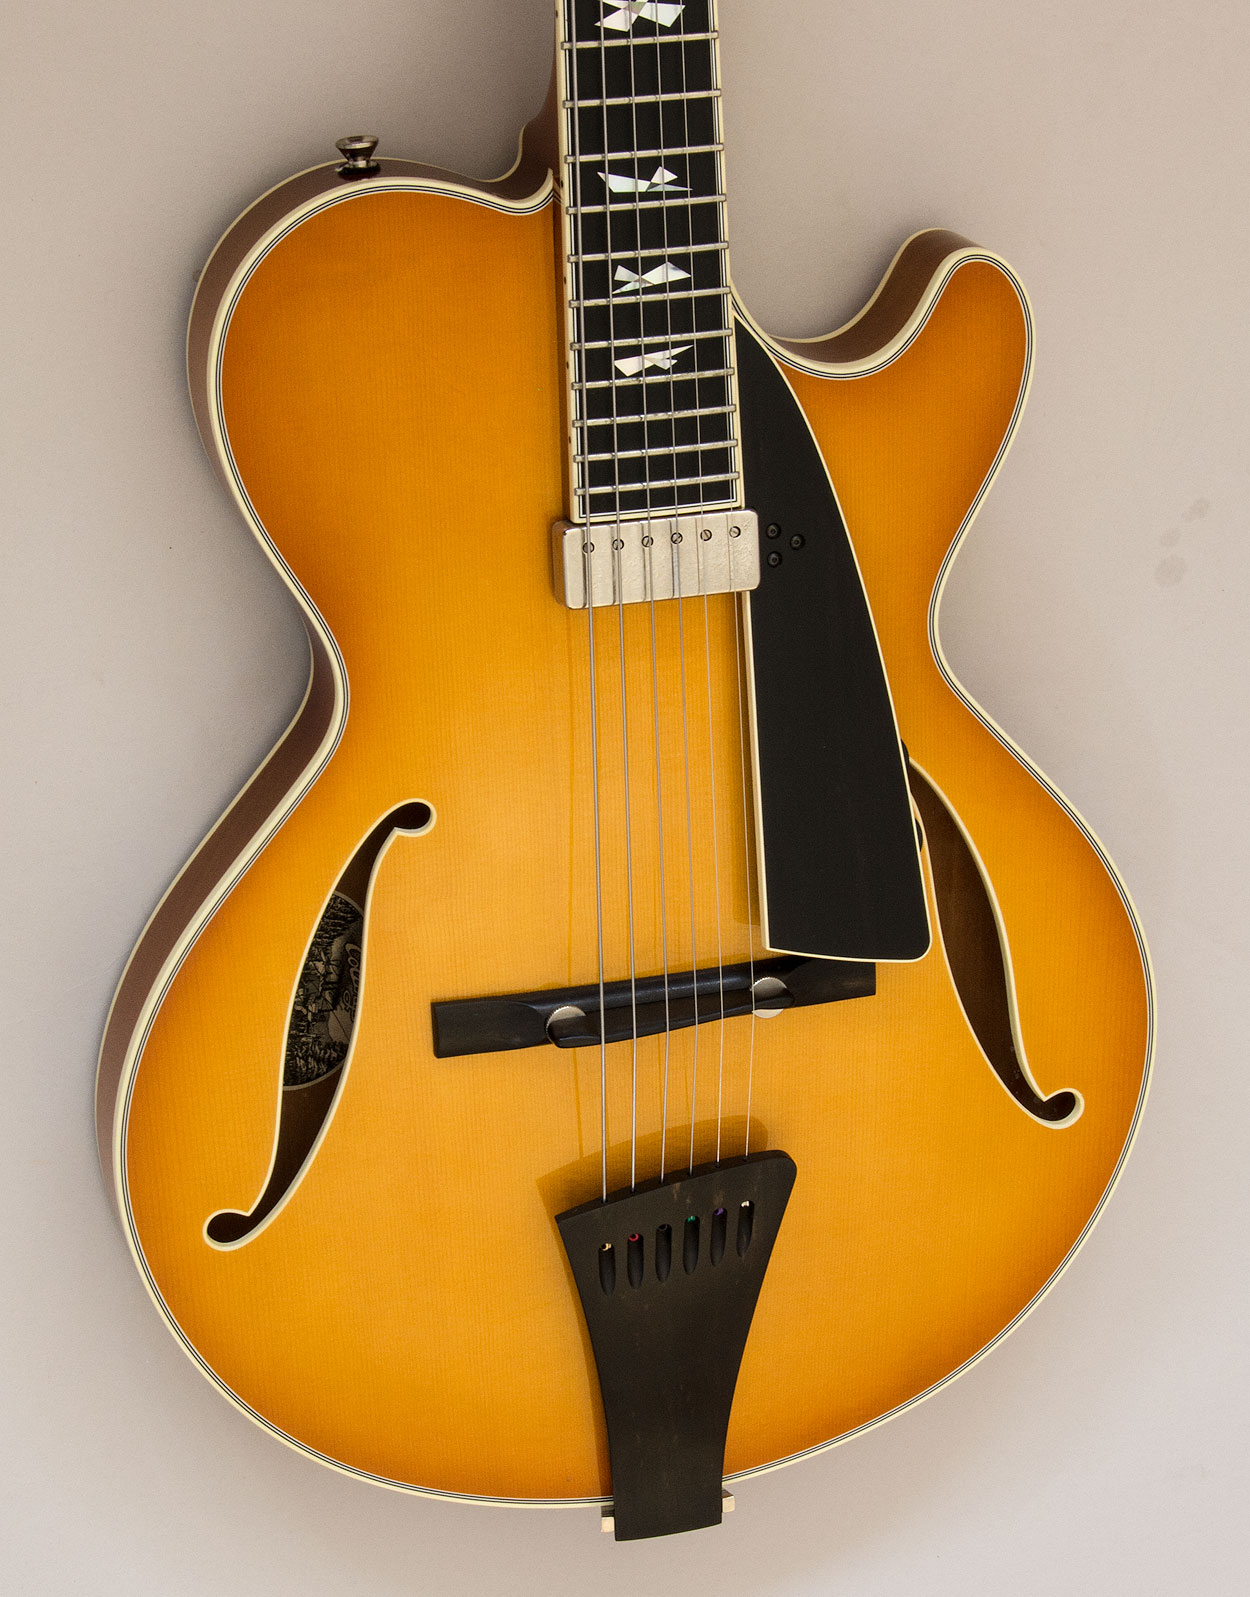 collings city limits jazz guitar for sale. Black Bedroom Furniture Sets. Home Design Ideas